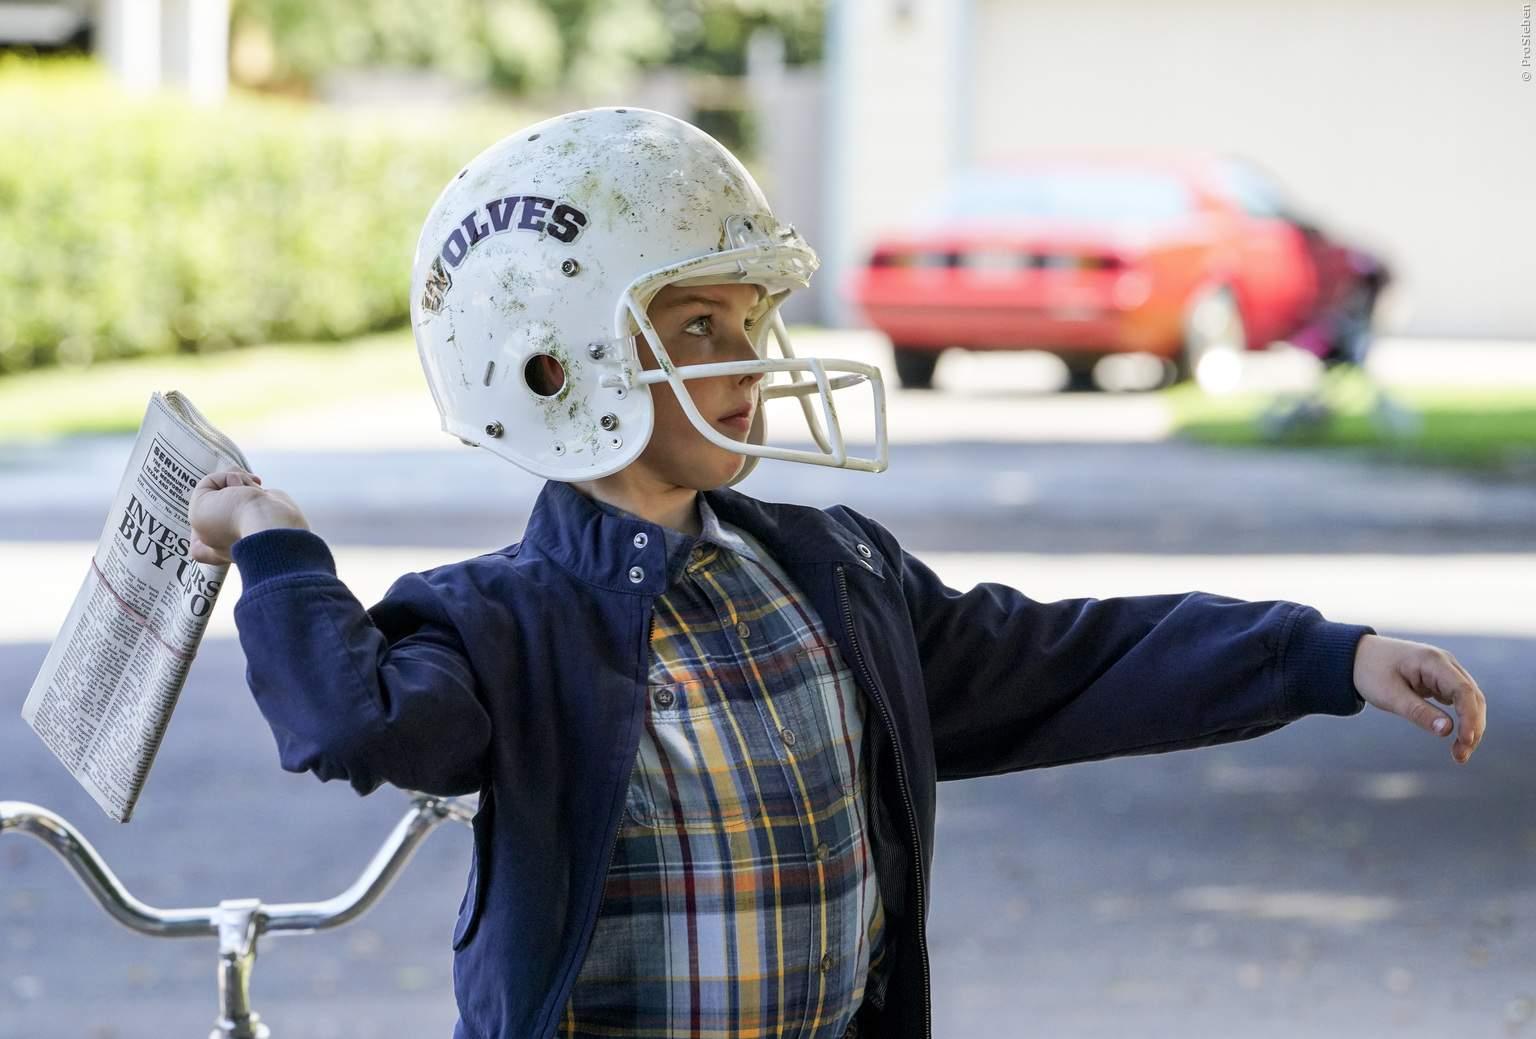 Szene aus Staffel 2 von Young Sheldon